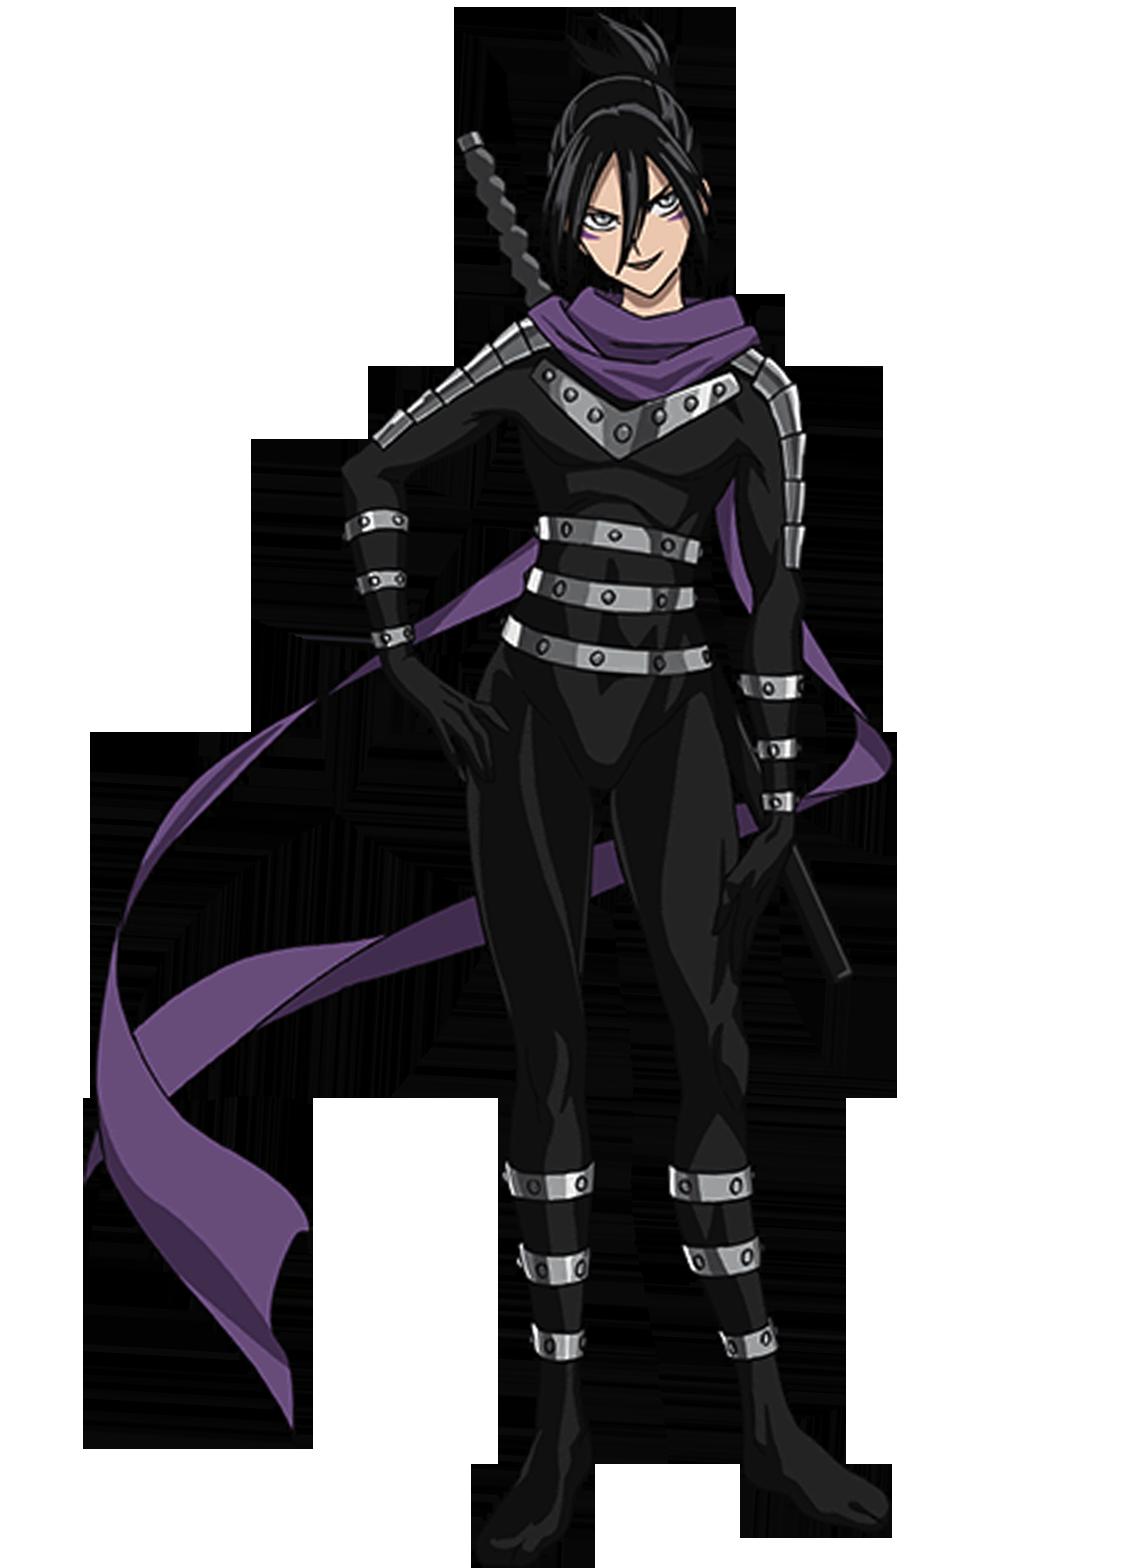 Pin De Angga Yudarta Em One Punch Man Anime Herois Desenhos